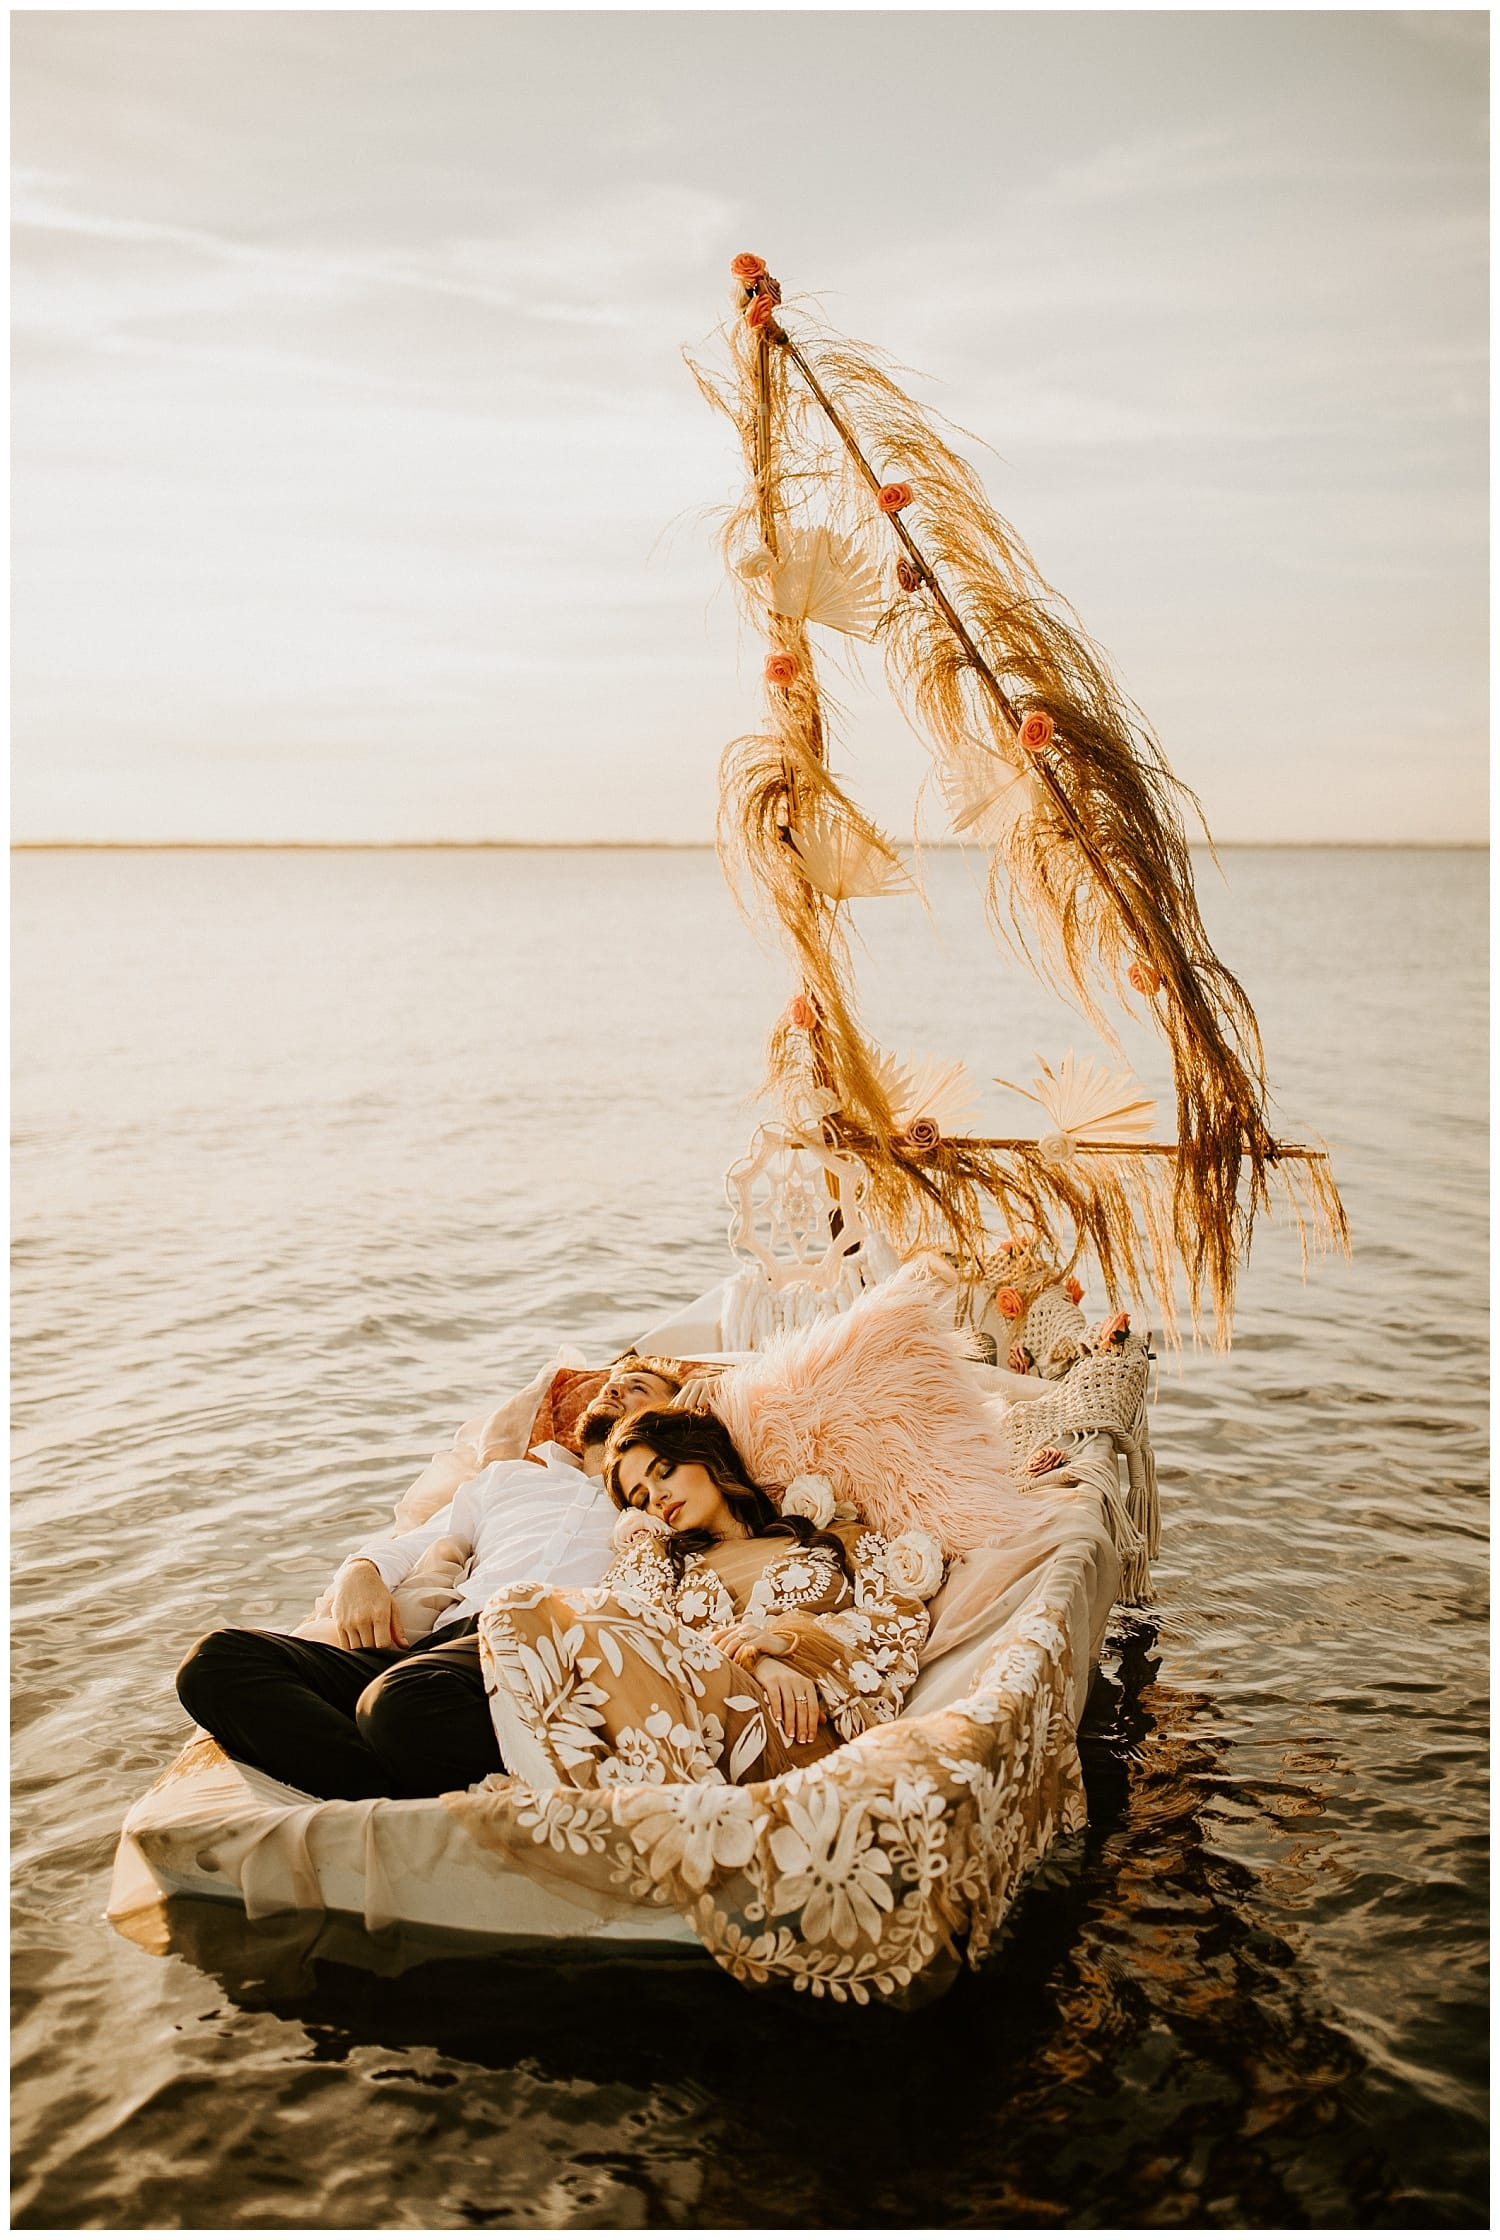 beachy boho elopement,beachy boho wedding,bohemian beach elopement,bohemian beach wedding,bohemian wedding,bohemian wedding dress,boho beach elopement,boho beach wedding,boho wedding,boho wedding dress,pampas grass sailboat,pampas grass wedding,riverboat elopement,riverboat wedding,rue de seine dress,rue de seine wedding dress,sailboat elopement,sailboat wedding,